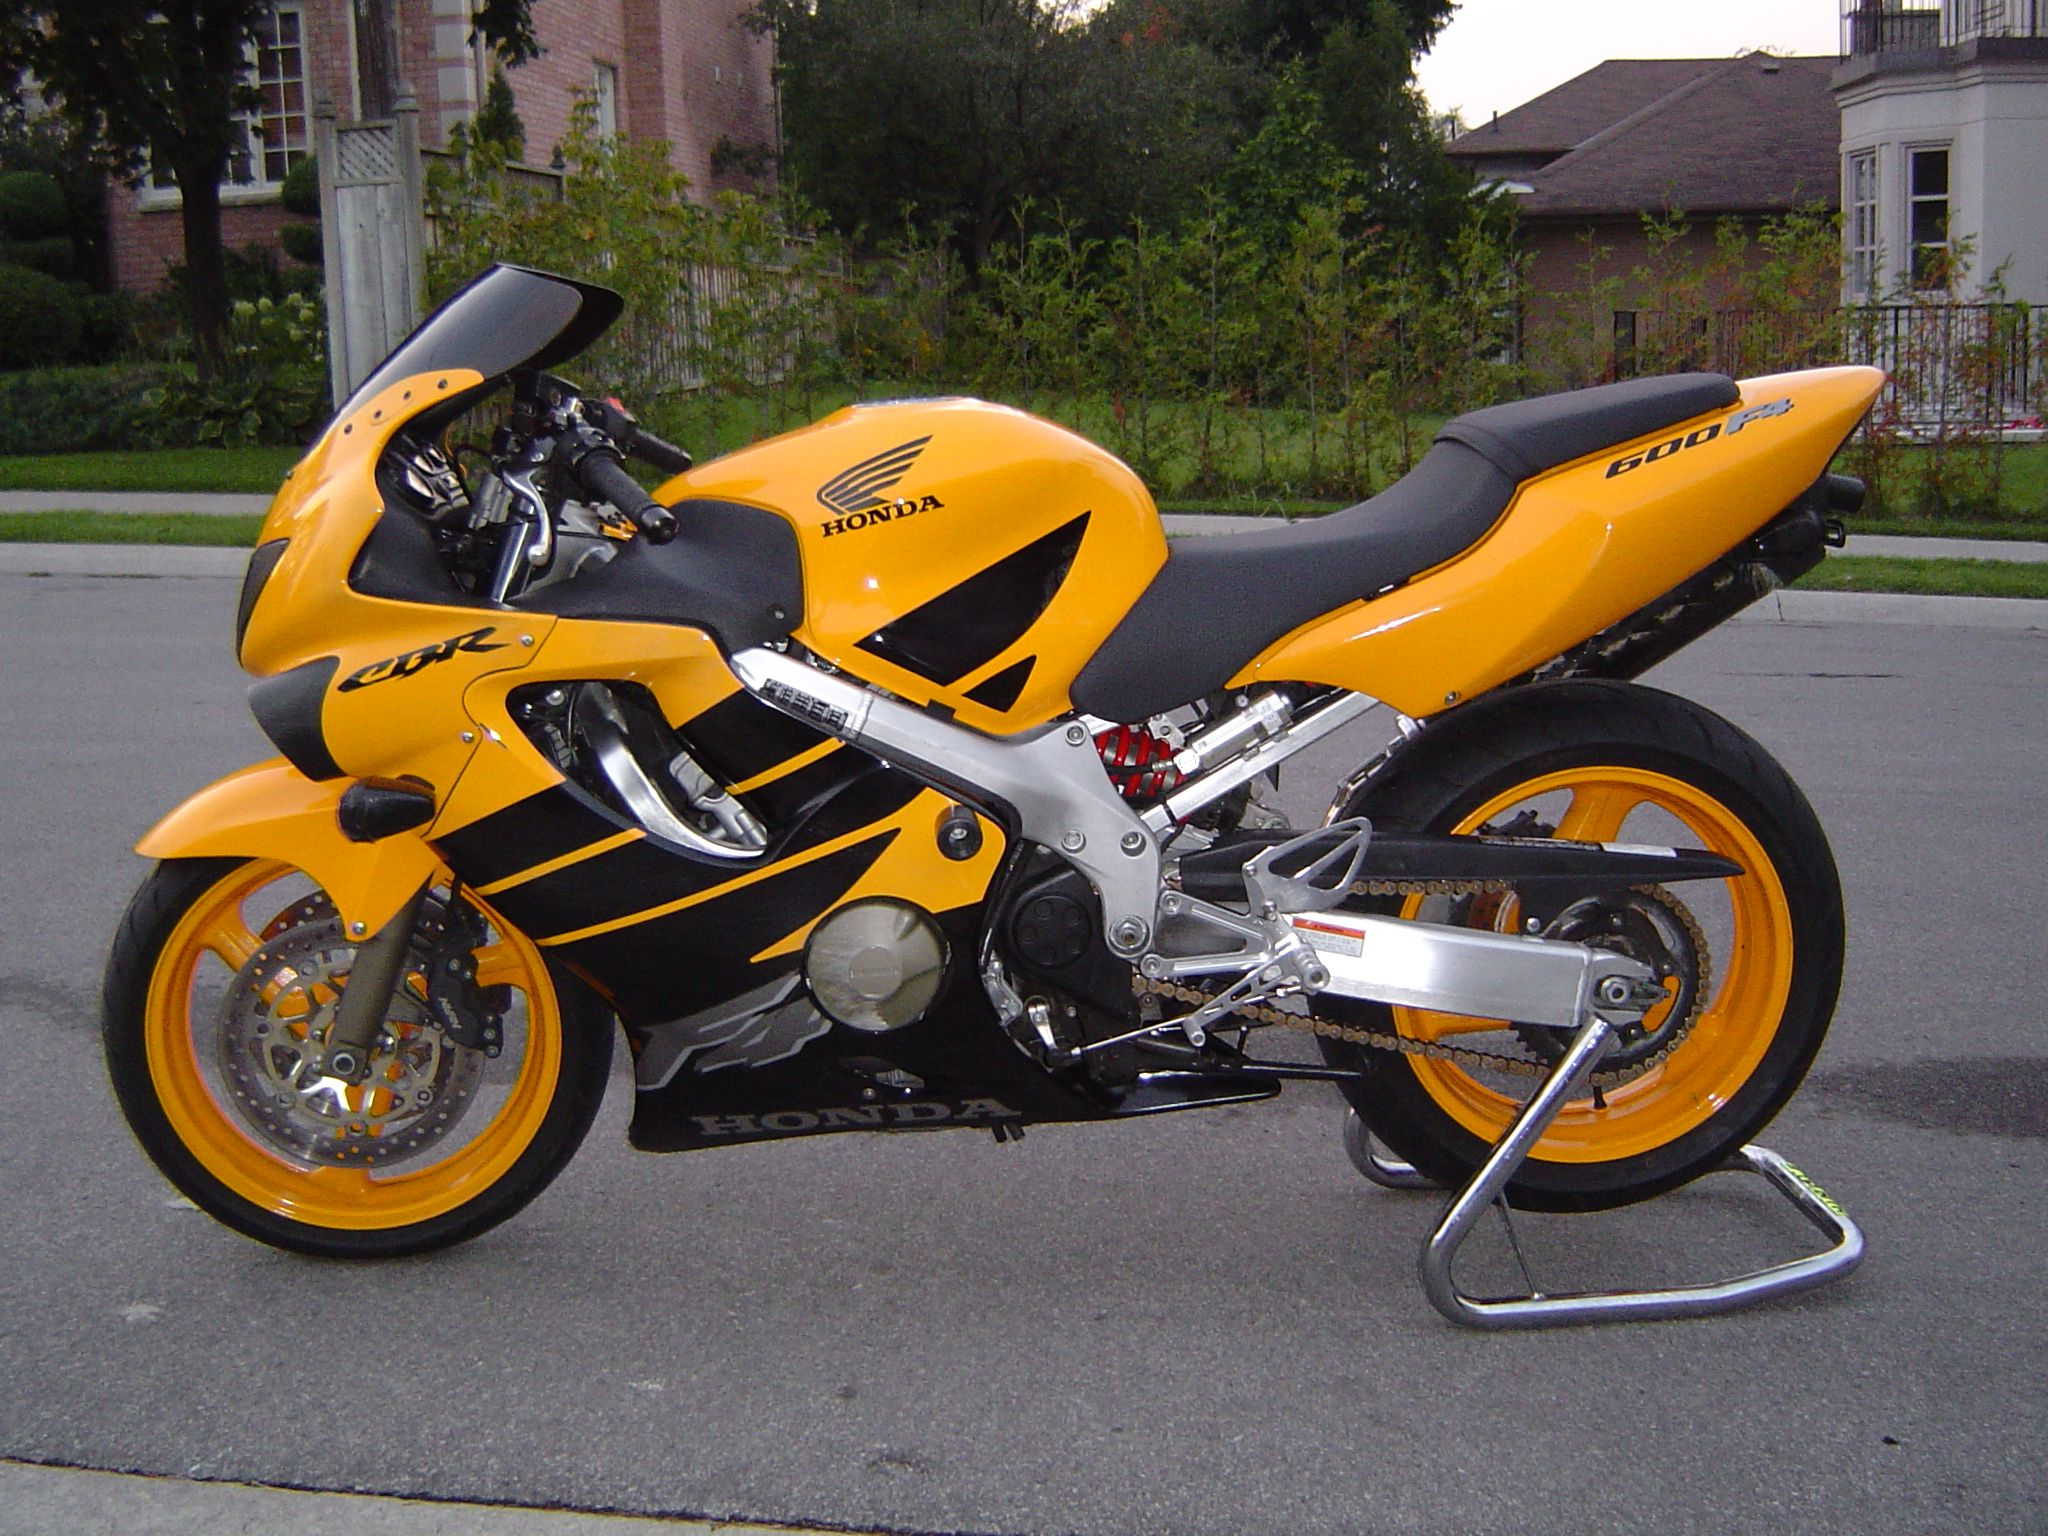 Honda Cbr600f4 With Colour Matched Rims 1999 Sports Bikes Motorcycles Racing Bikes Honda Cbr